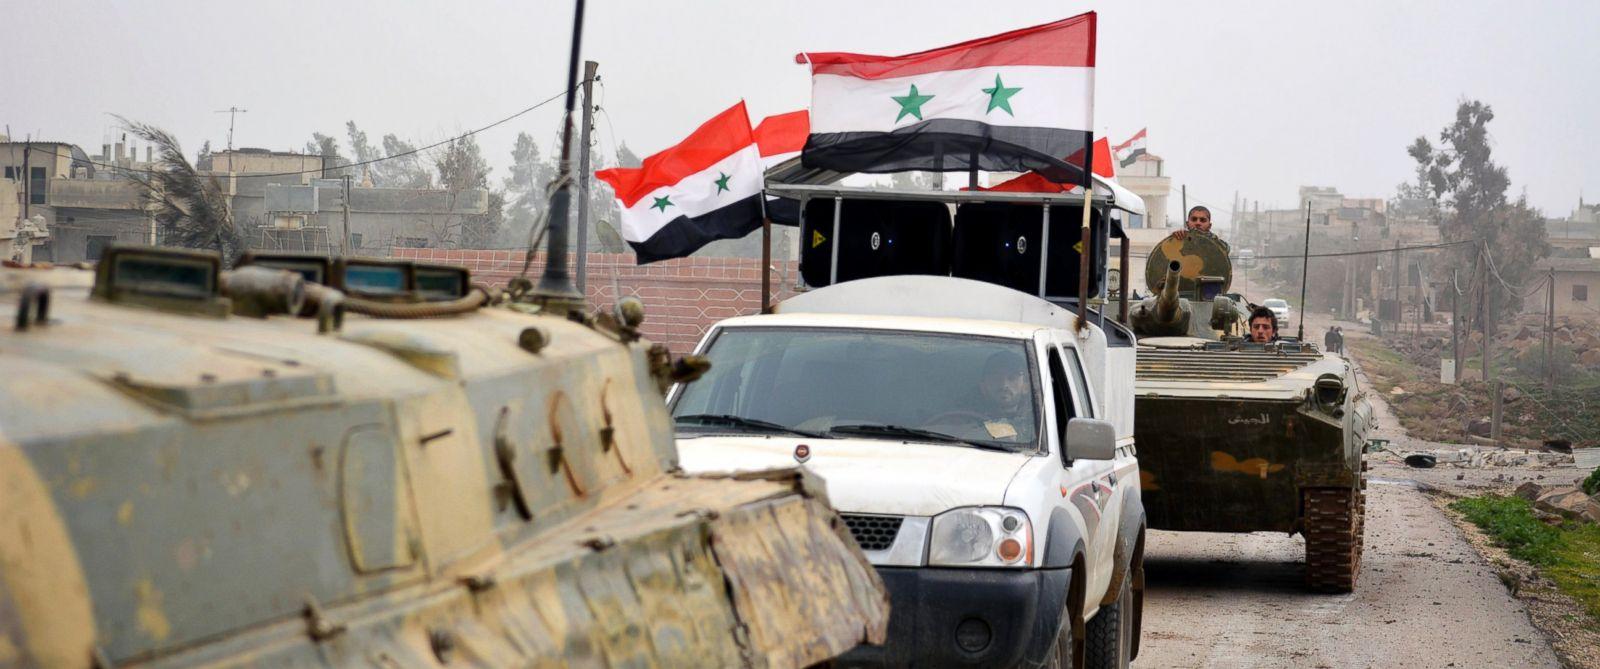 Syrian Army kills 21 ISIS terrorists while liberating Jabal Thardeh in Deir Ezzor